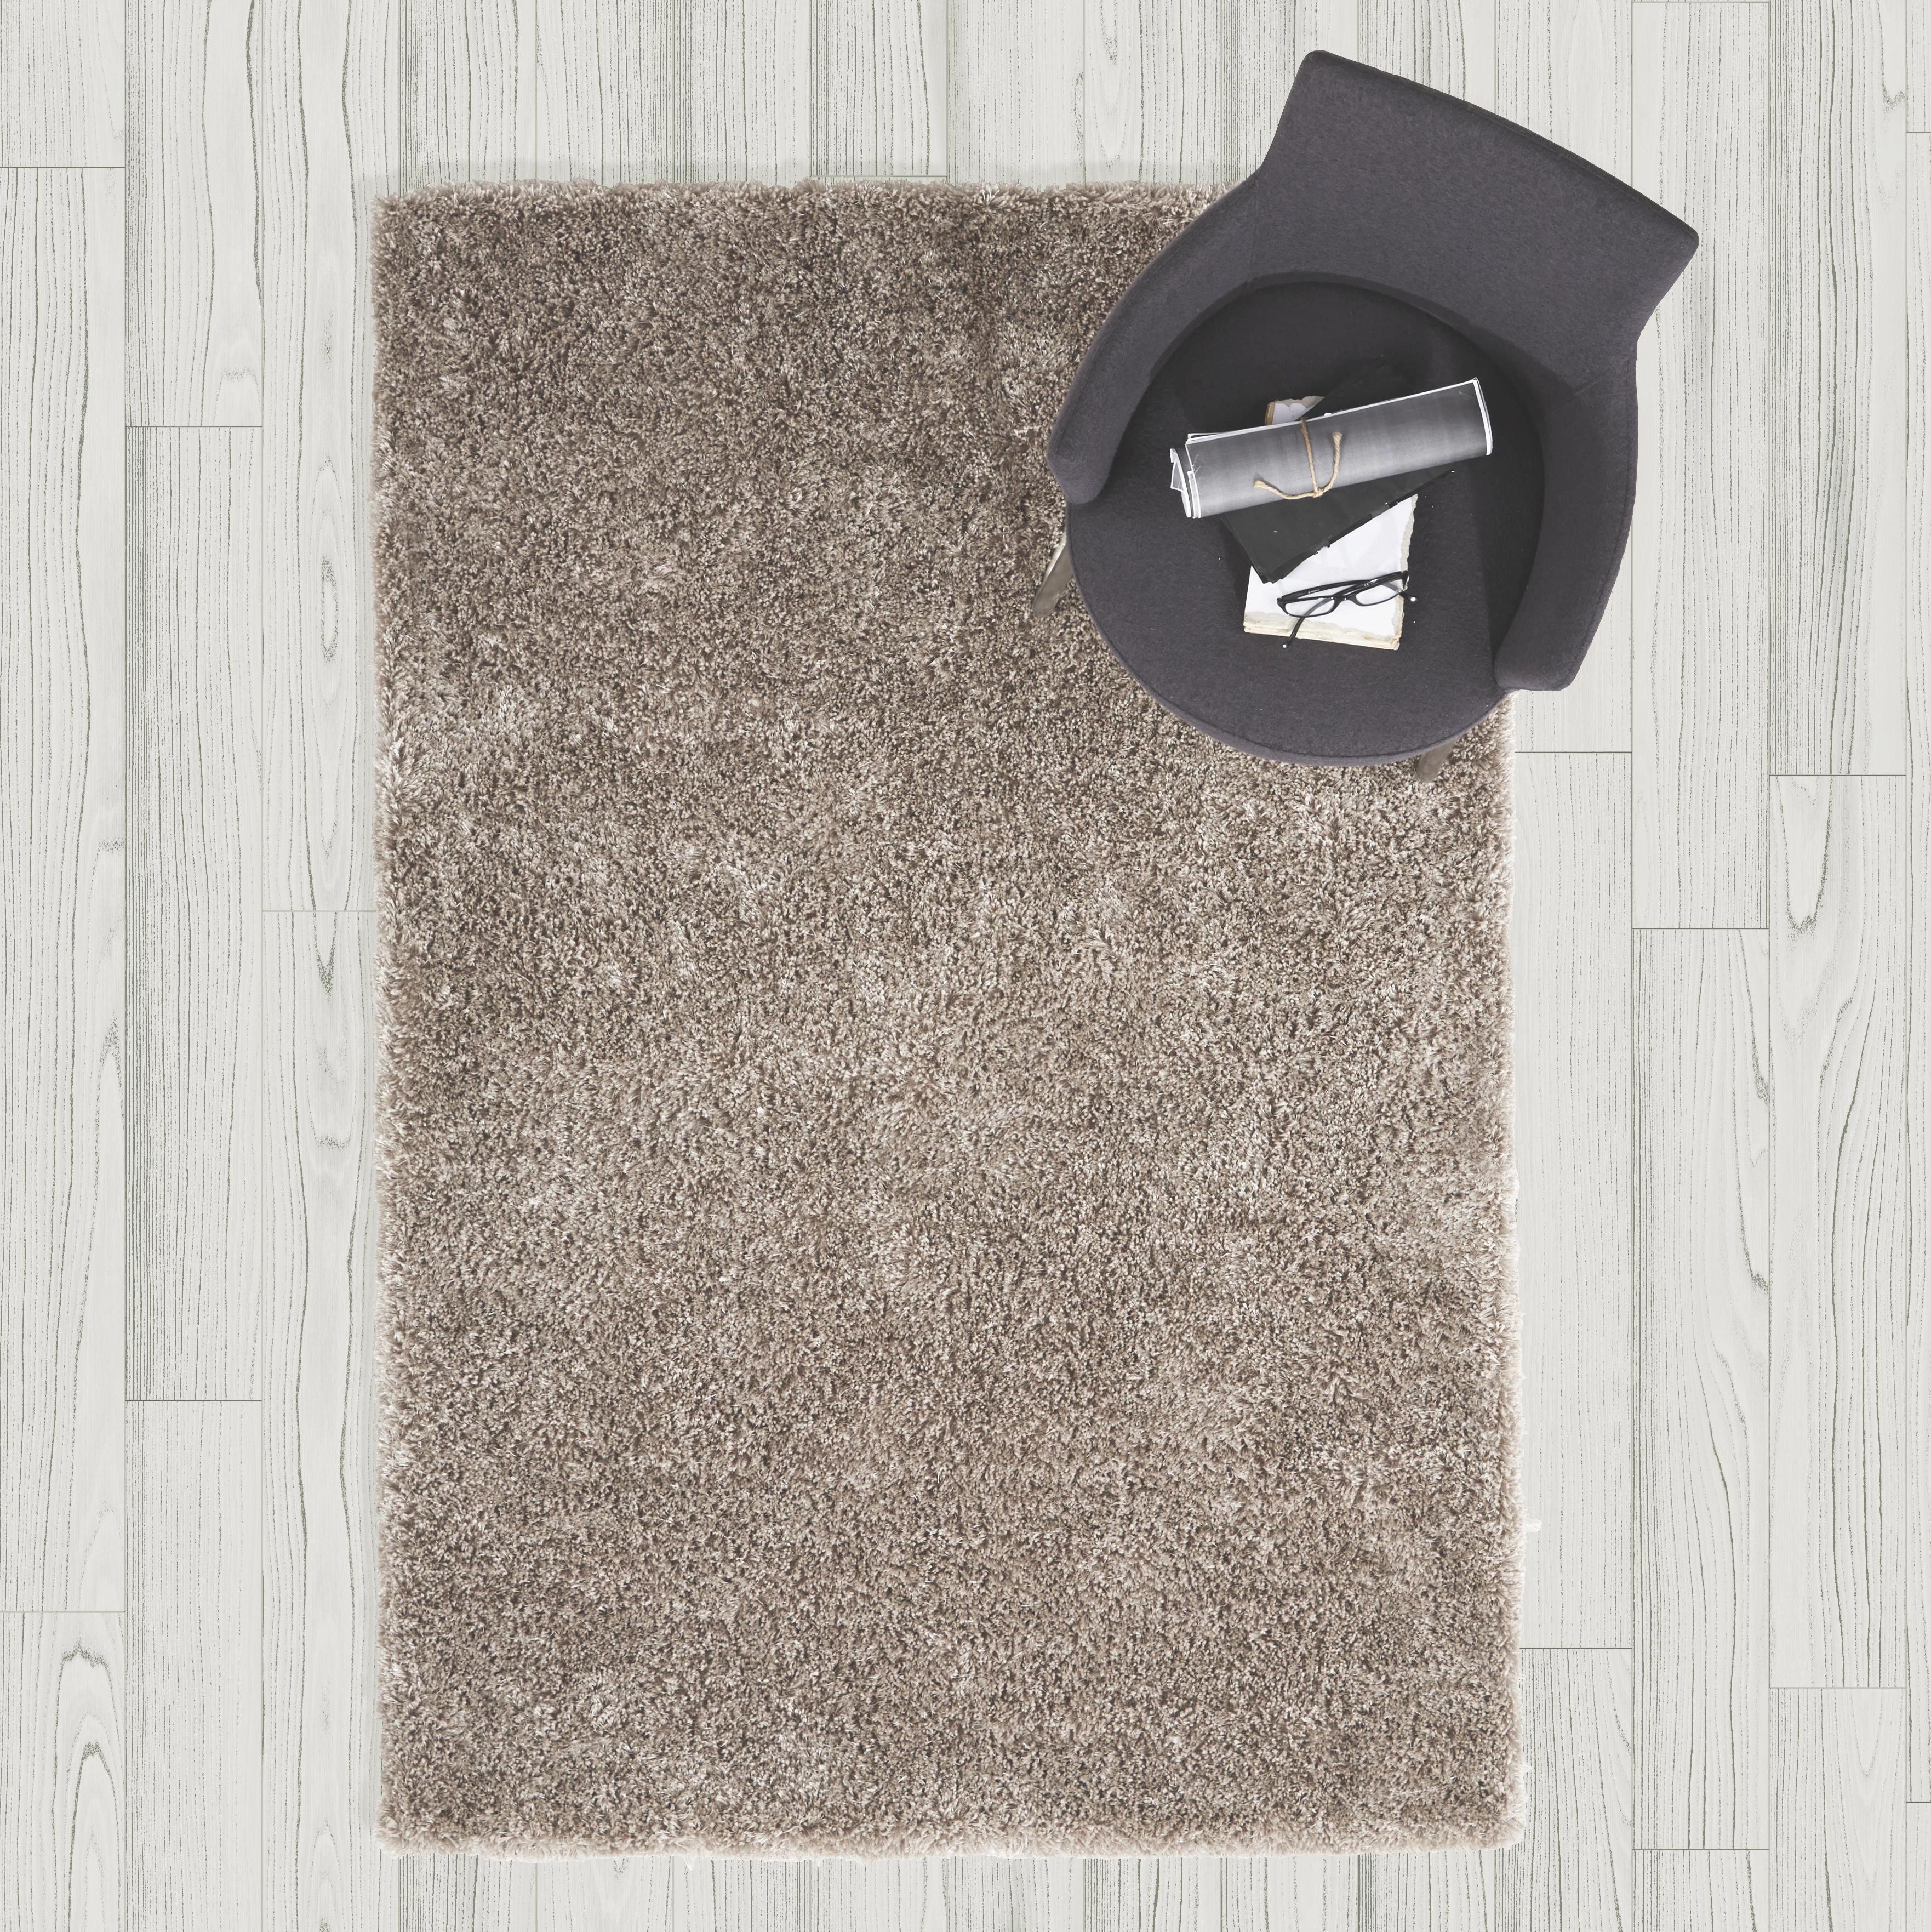 Hochflorteppich Shaggy 120x170cm - Grau, MODERN, Textil (120/170cm) - MÖMAX modern living